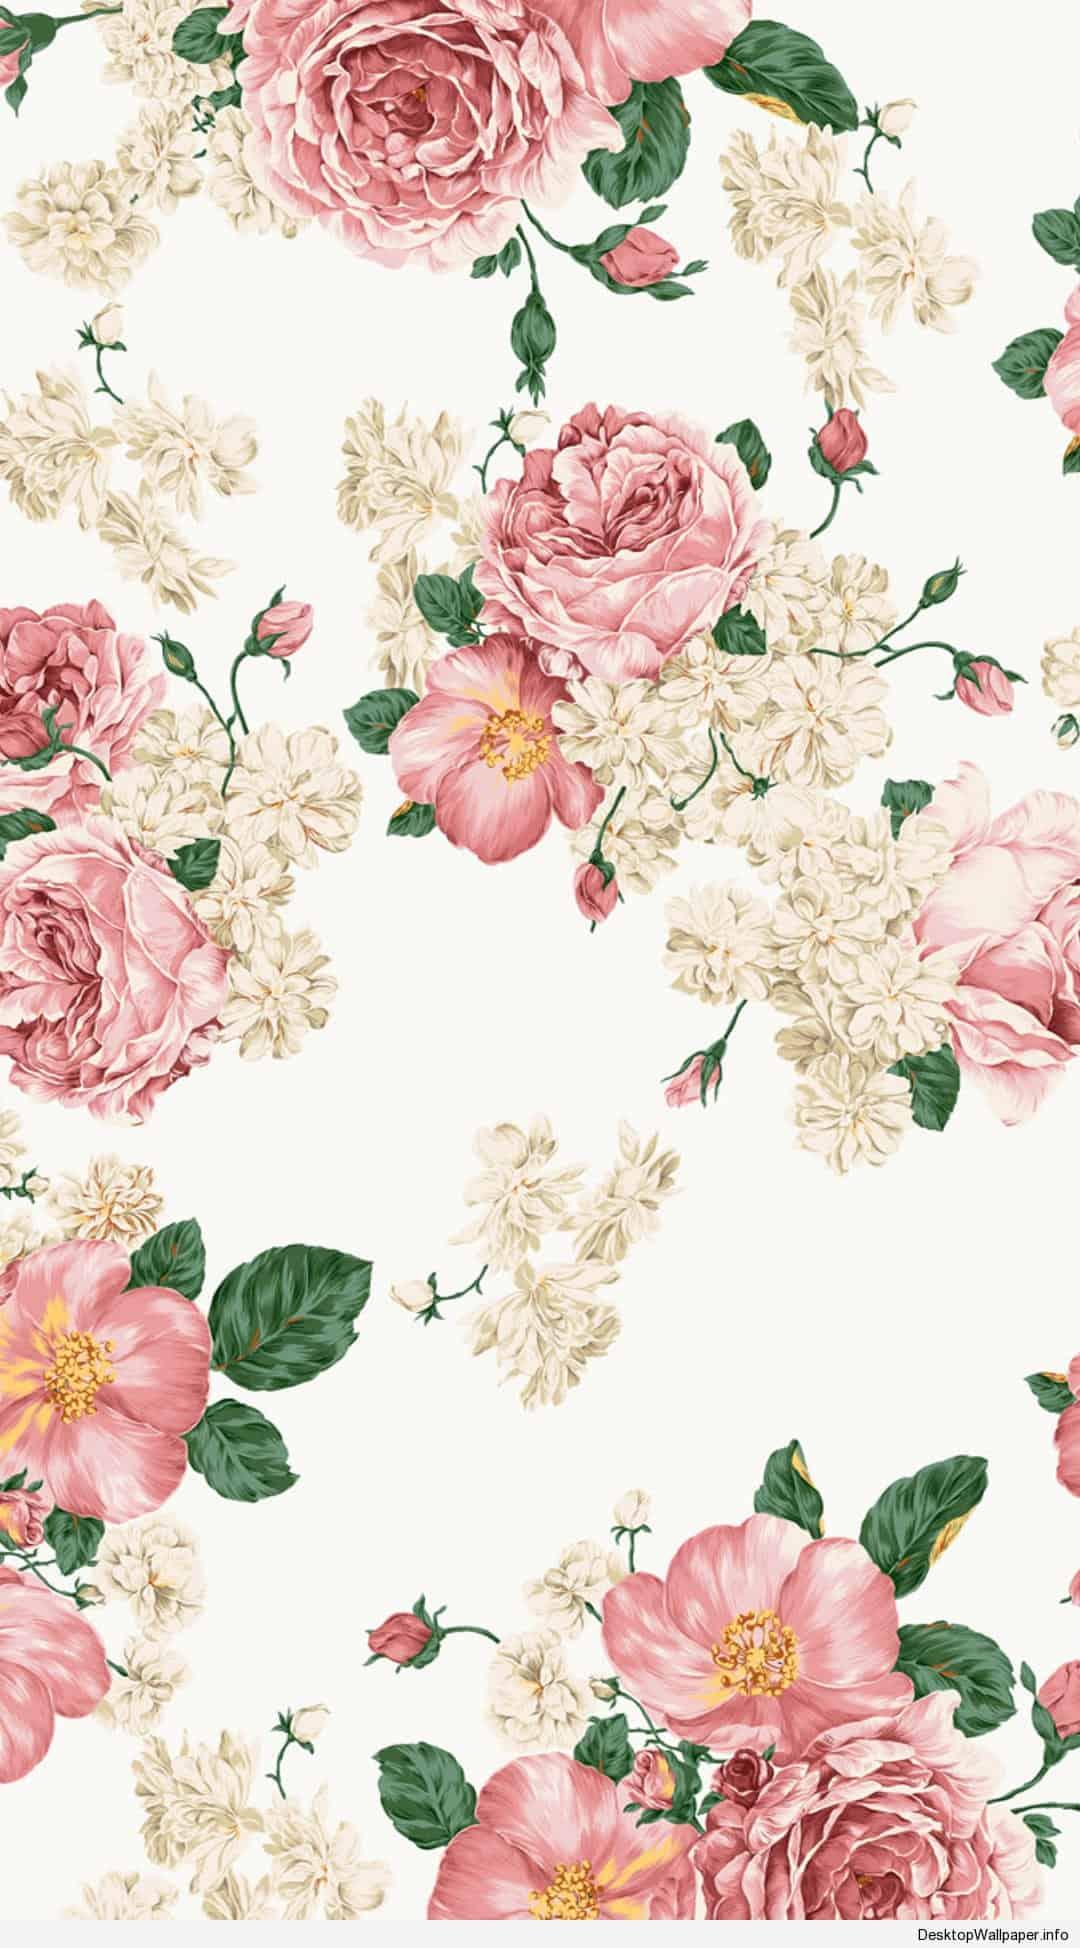 Cool Wallpapers Hd Iphone 7 Floral Wallpaper Iphone Pixelstalk Net